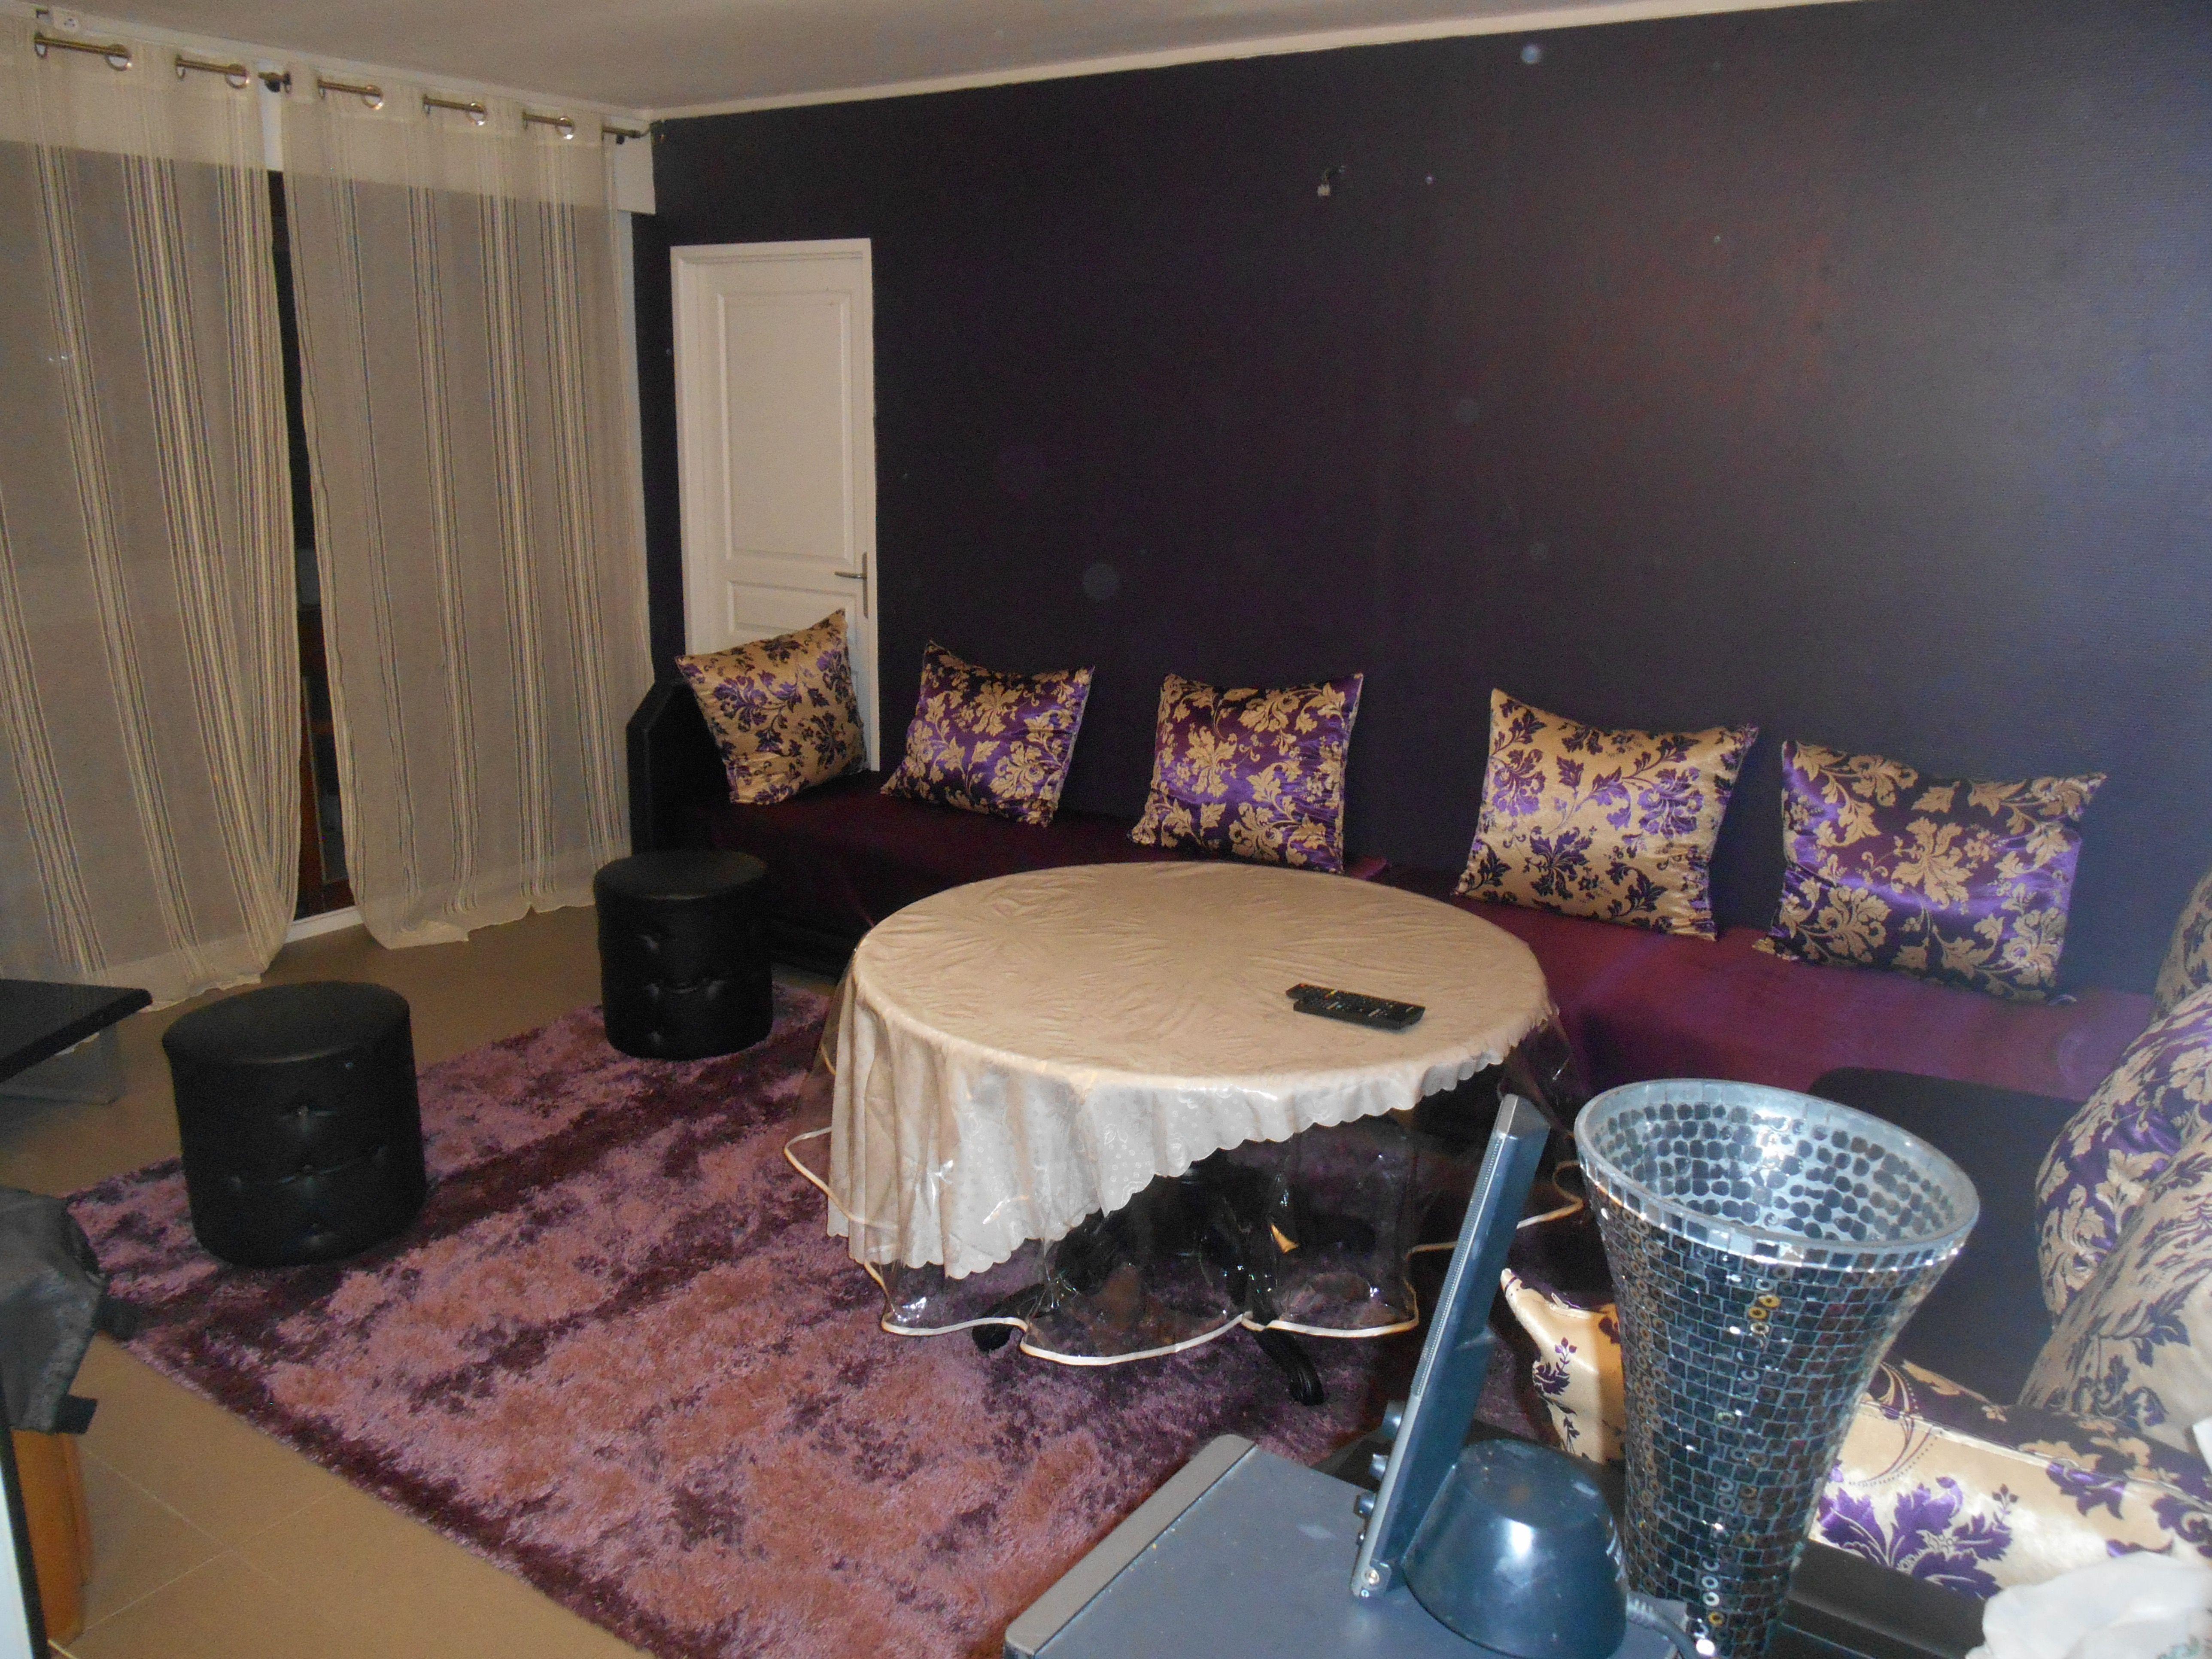 Chambre-Colocation Chilly-Mazarin HOMOSEXUELLE & Location Chambre à louer Chilly-Mazarin HOMOSEXUELLE | Loue chambre meublée Chilly-Mazarin HOMOSEXUELLE | Logement Chilly-Mazarin HOMOSEXUELLE